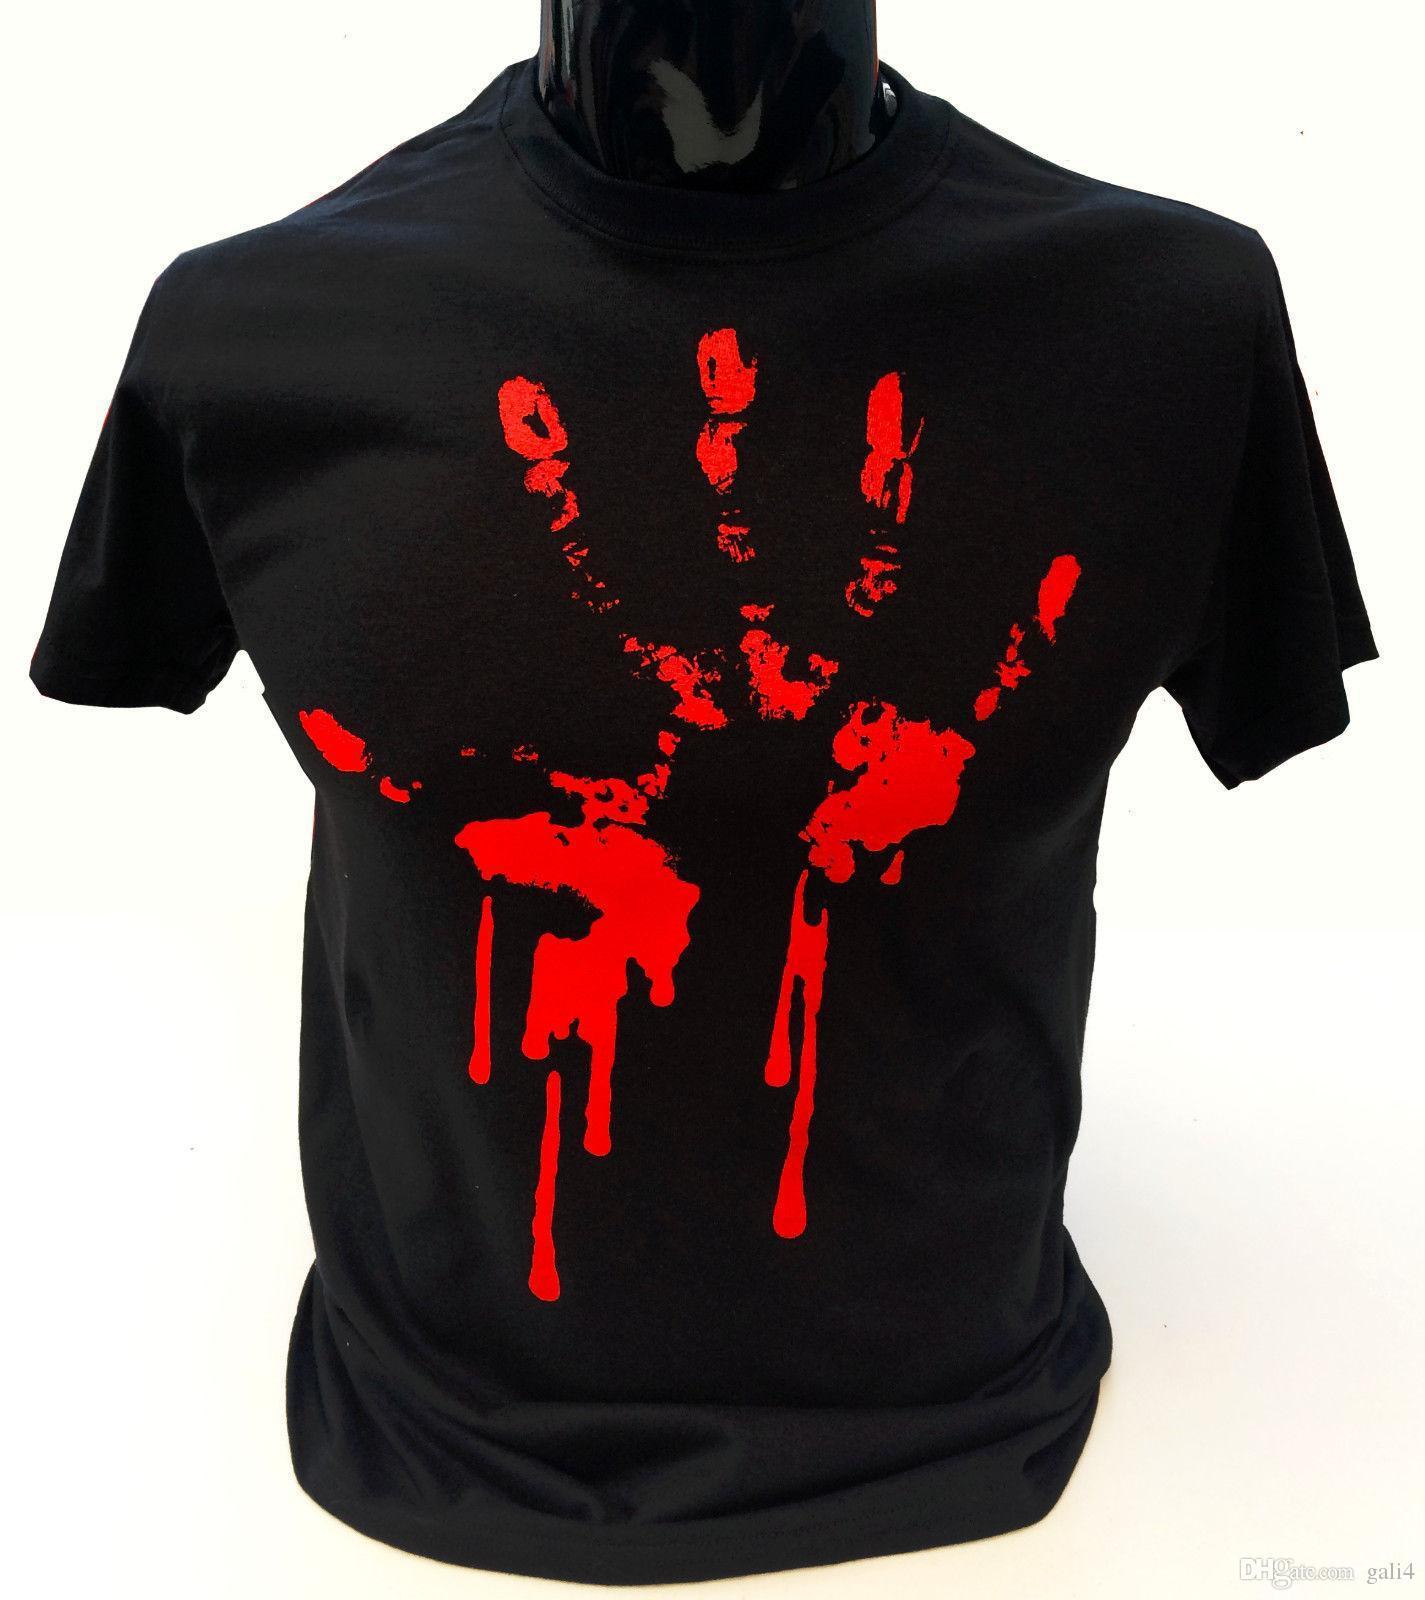 30cd45be14550 Bloody Mano Camiseta Estampada Hombre S 2xl GÓTICO ROCK Zombie Punk  Halloween Awesome Tee Shirt Funny T Shirts Prints From Gali4